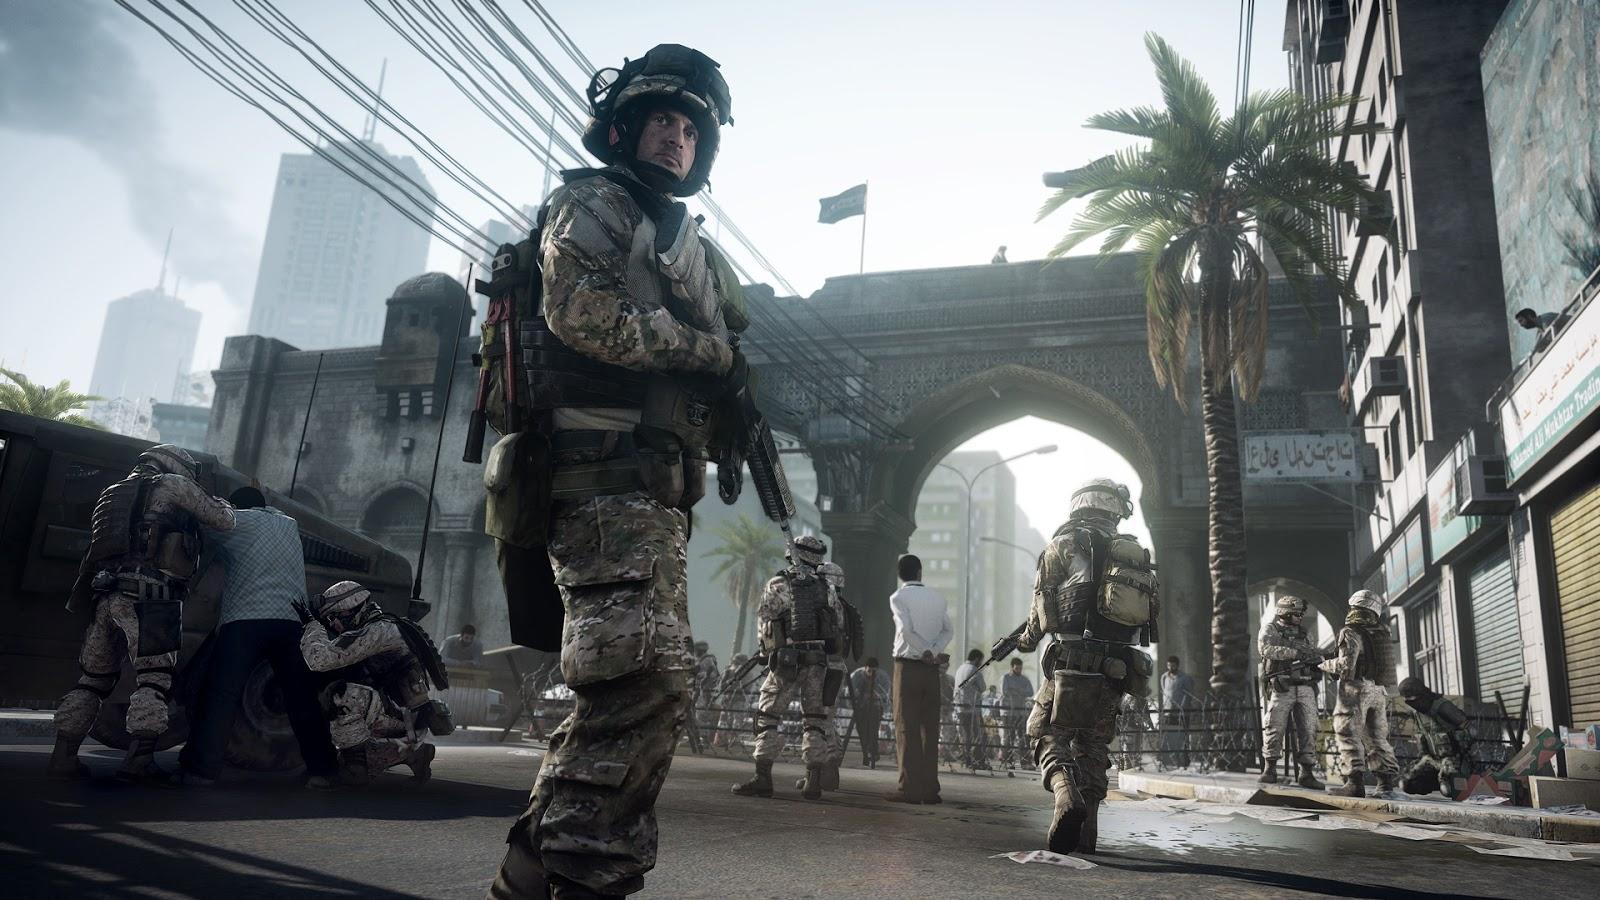 Battlefield 3 PC Game Screen Shot, Wallpapers